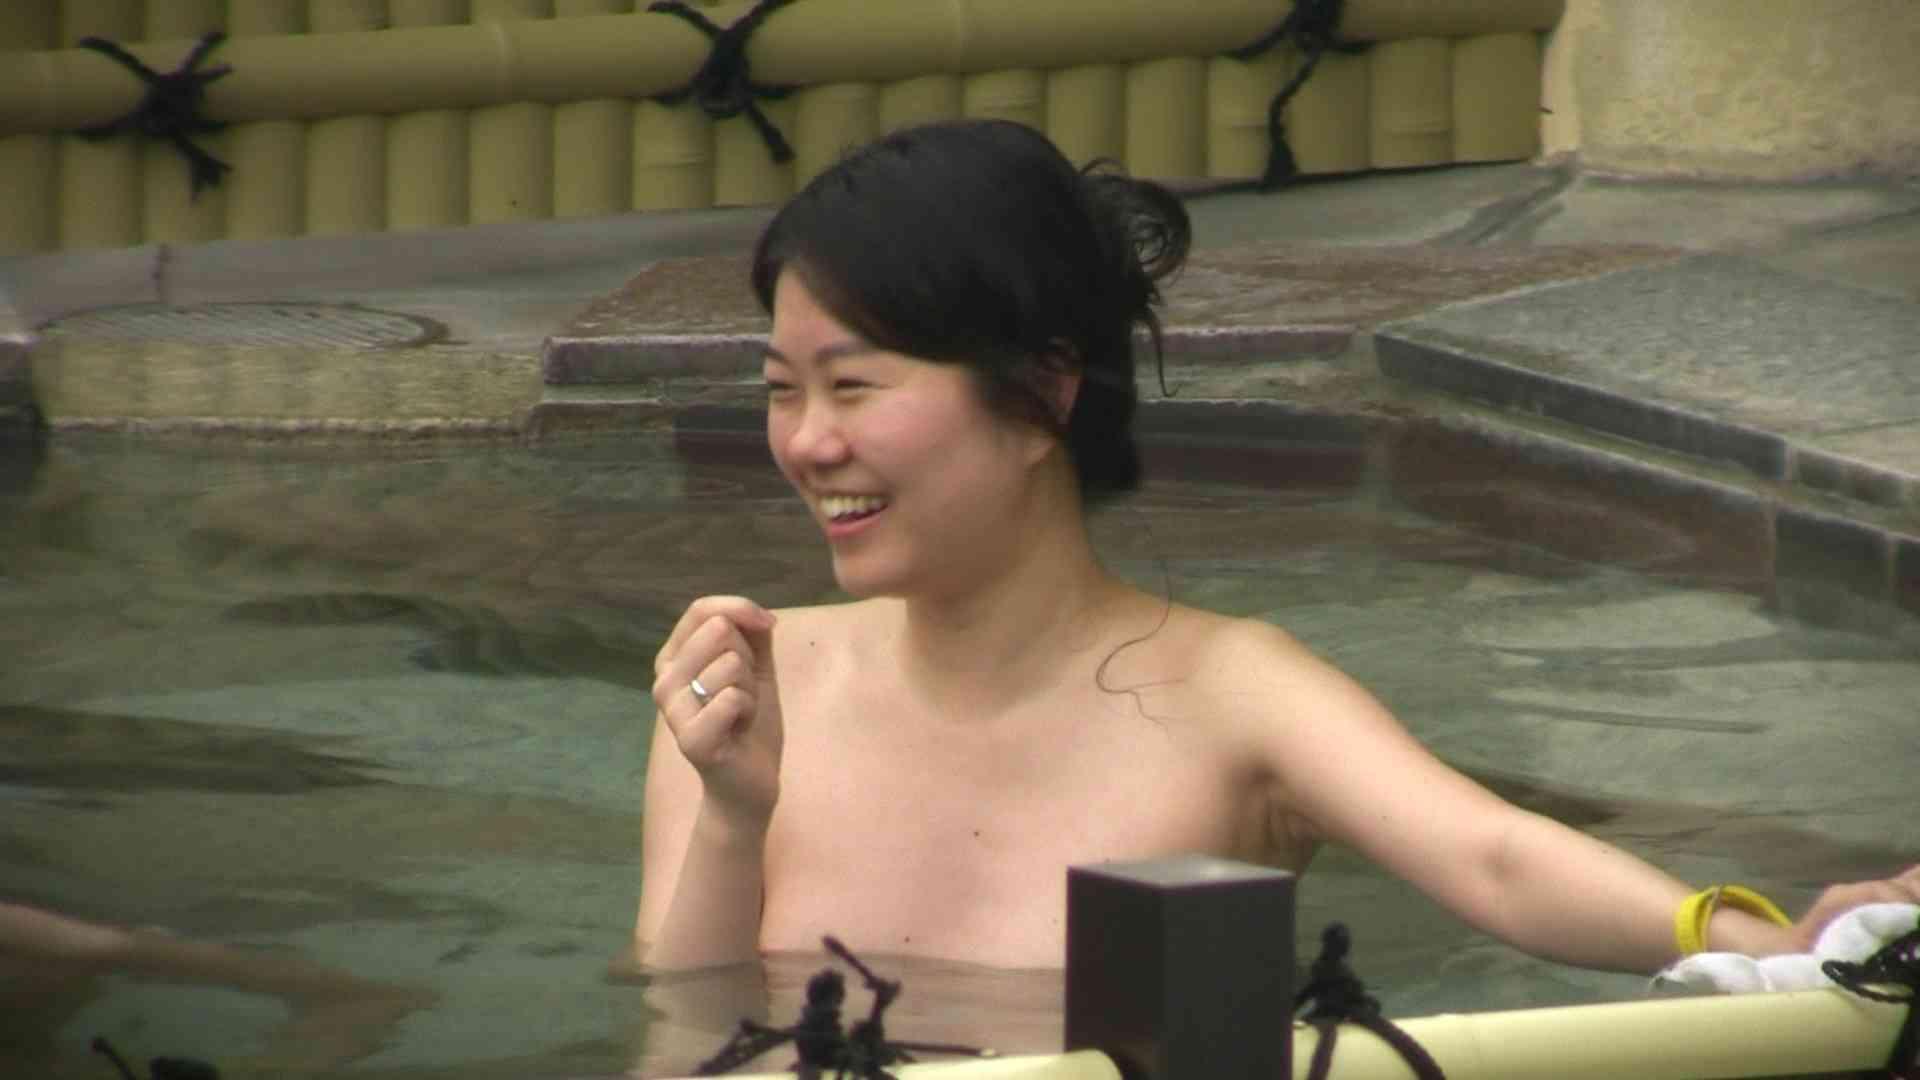 Aquaな露天風呂Vol.675 0  44連発 2